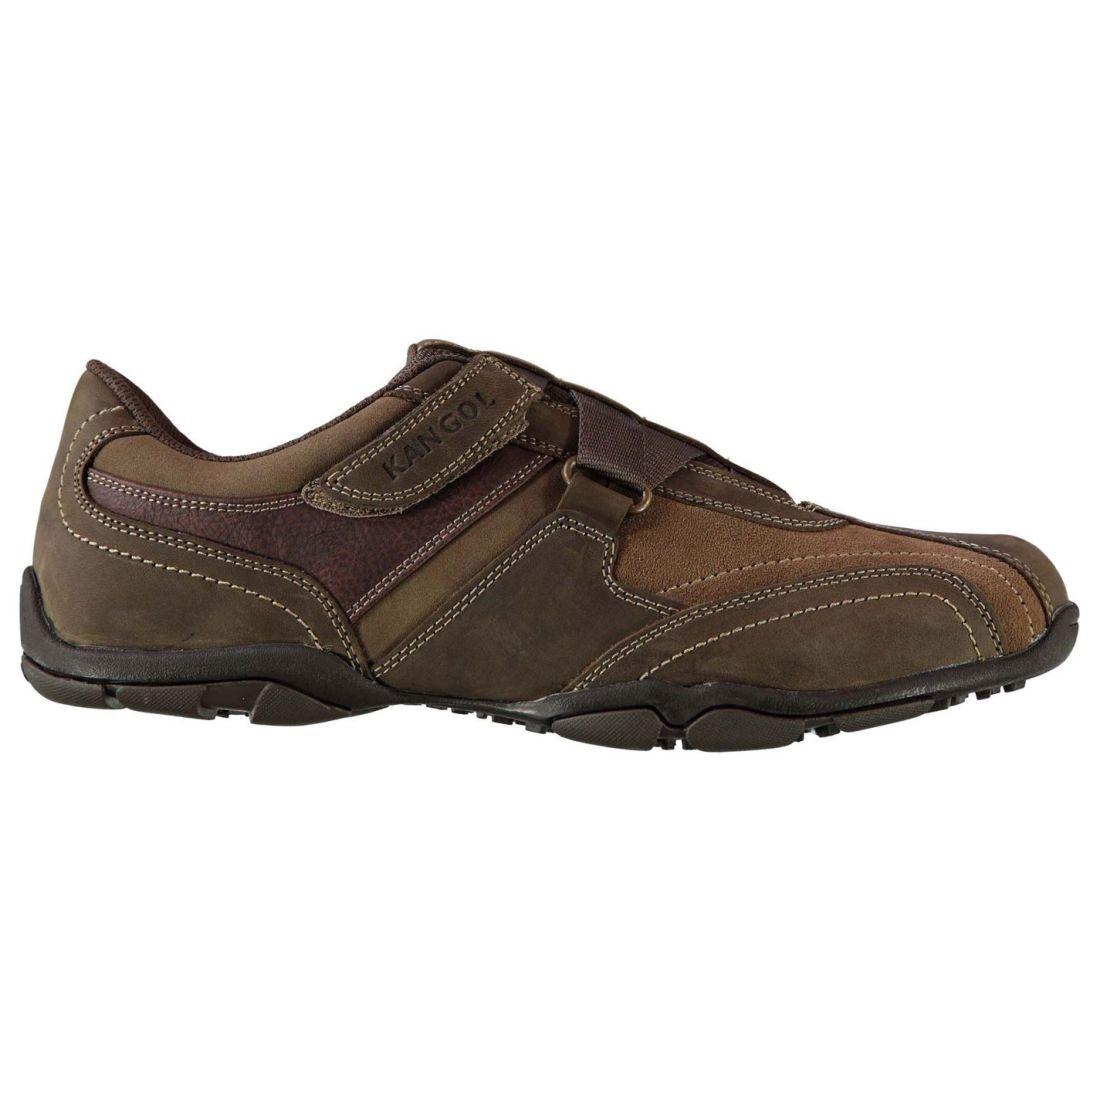 Kangol Mens Oahu shoes Casual Hook and Loop Leather Upper Memory Foam